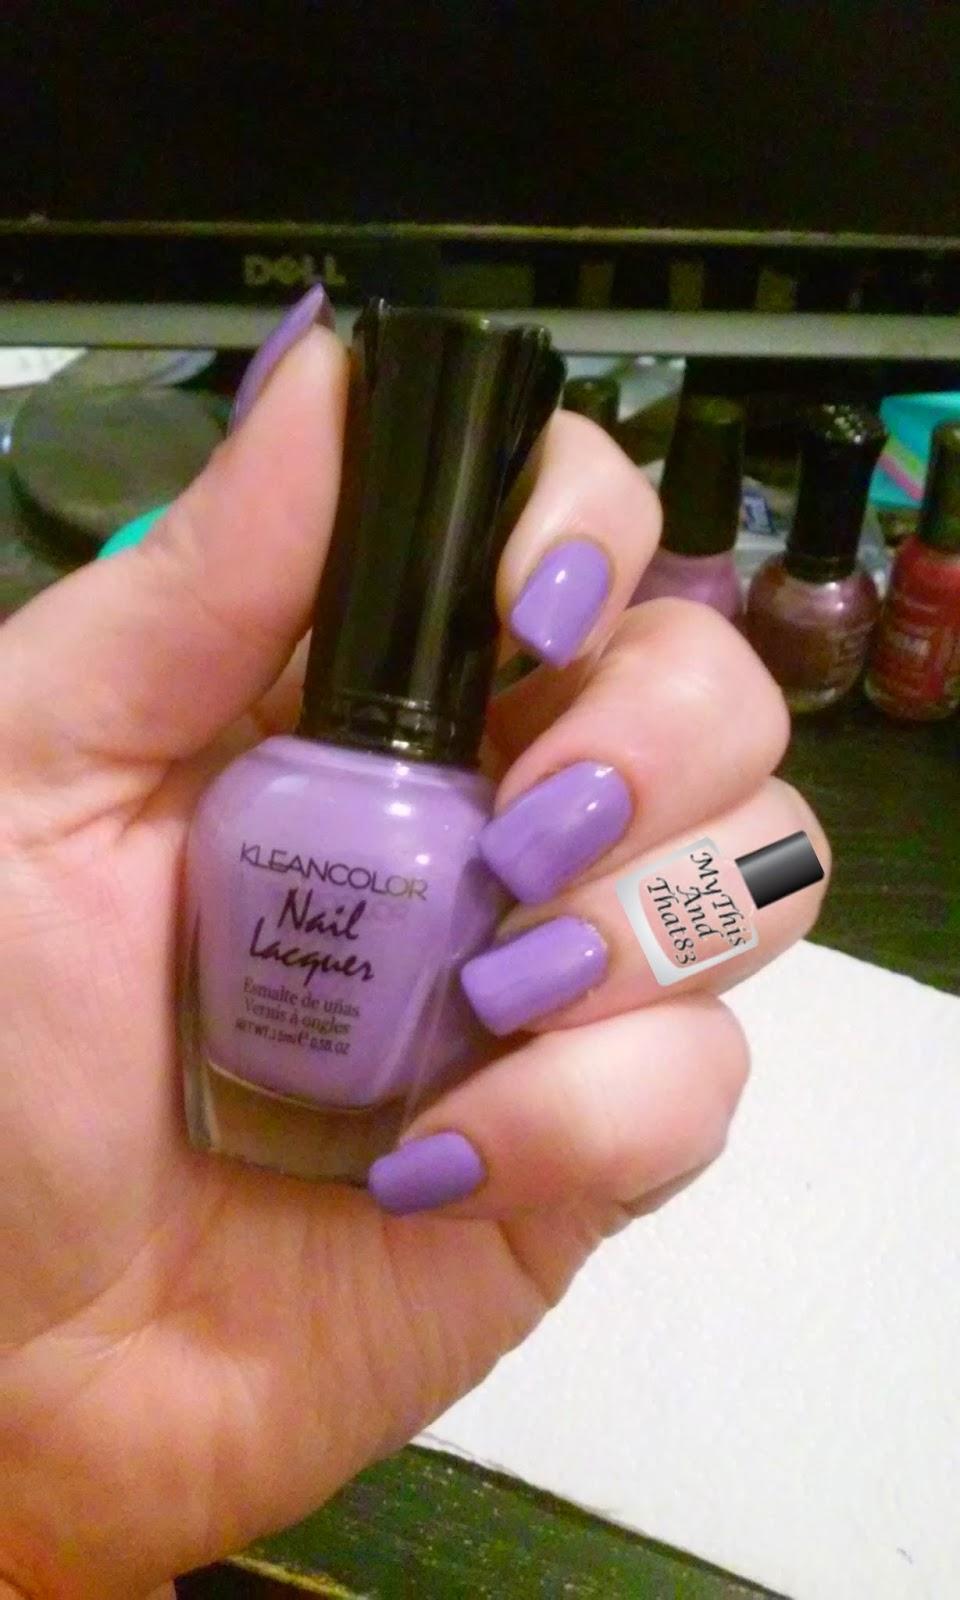 Kleancolor pastel purple nail polish